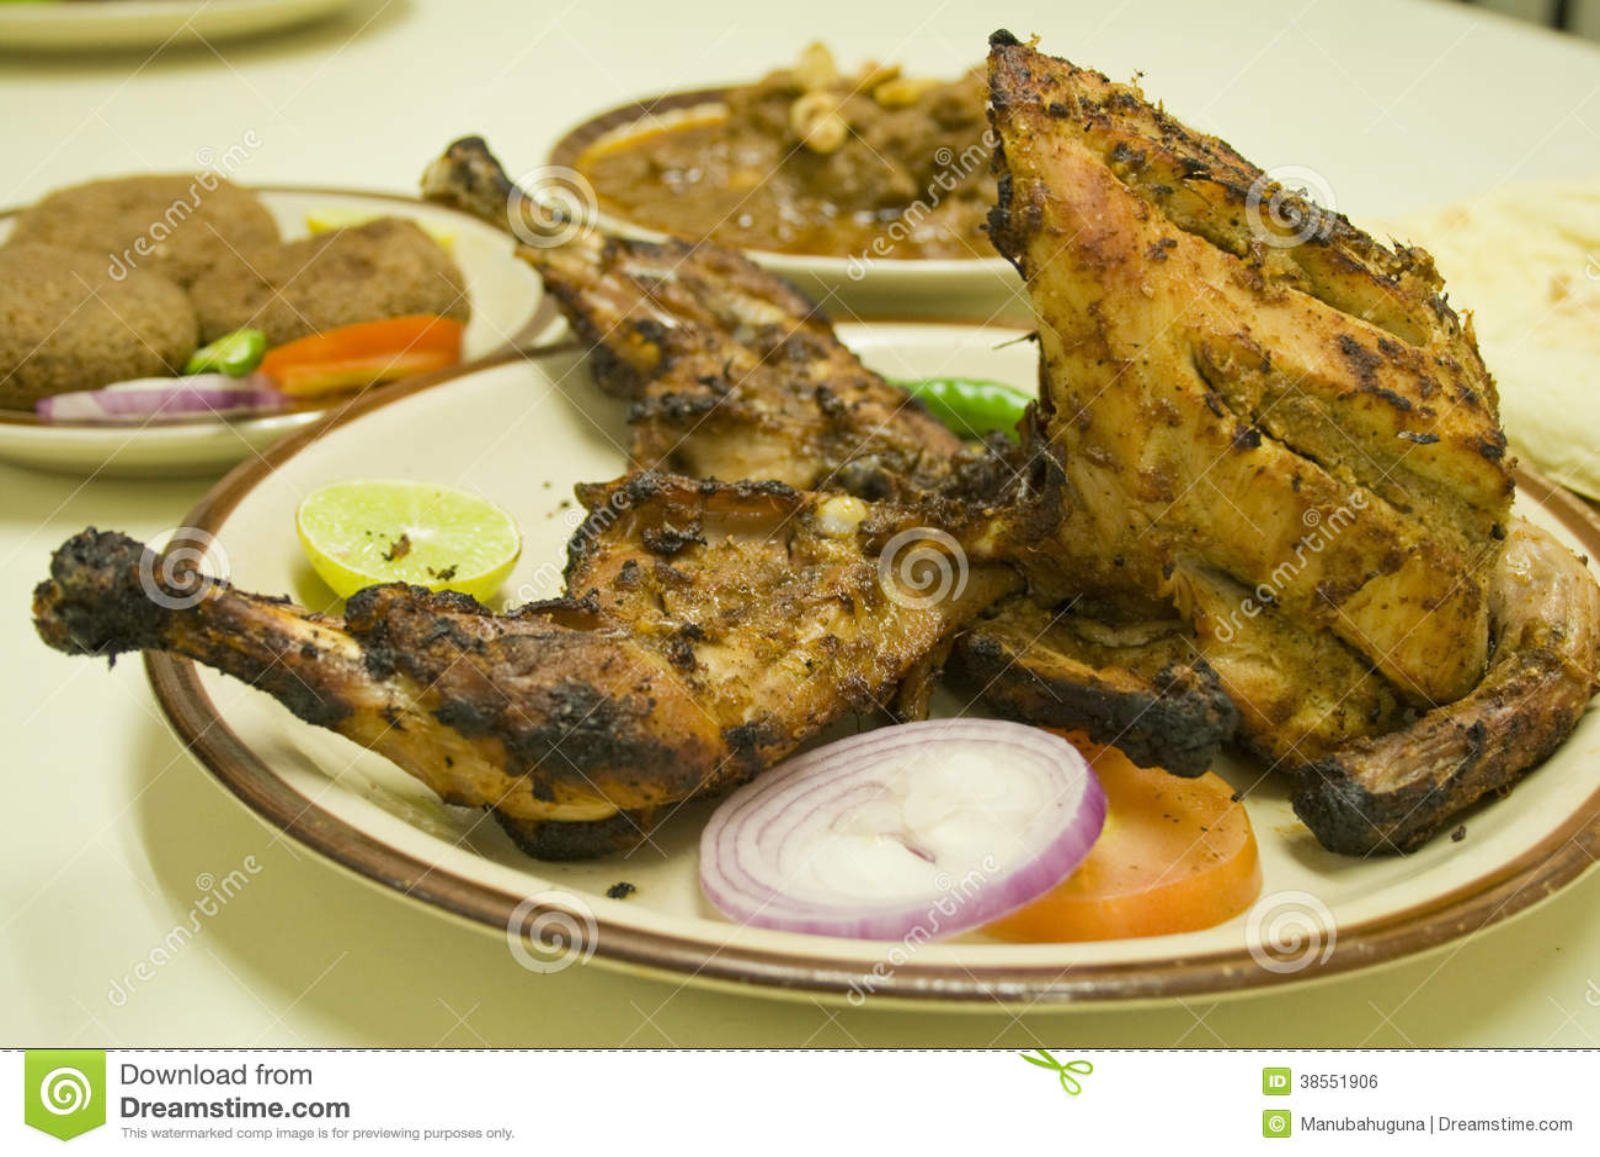 Mughlai cuisine royalty free stock image image 38551906 for Cuisines of uttar pradesh